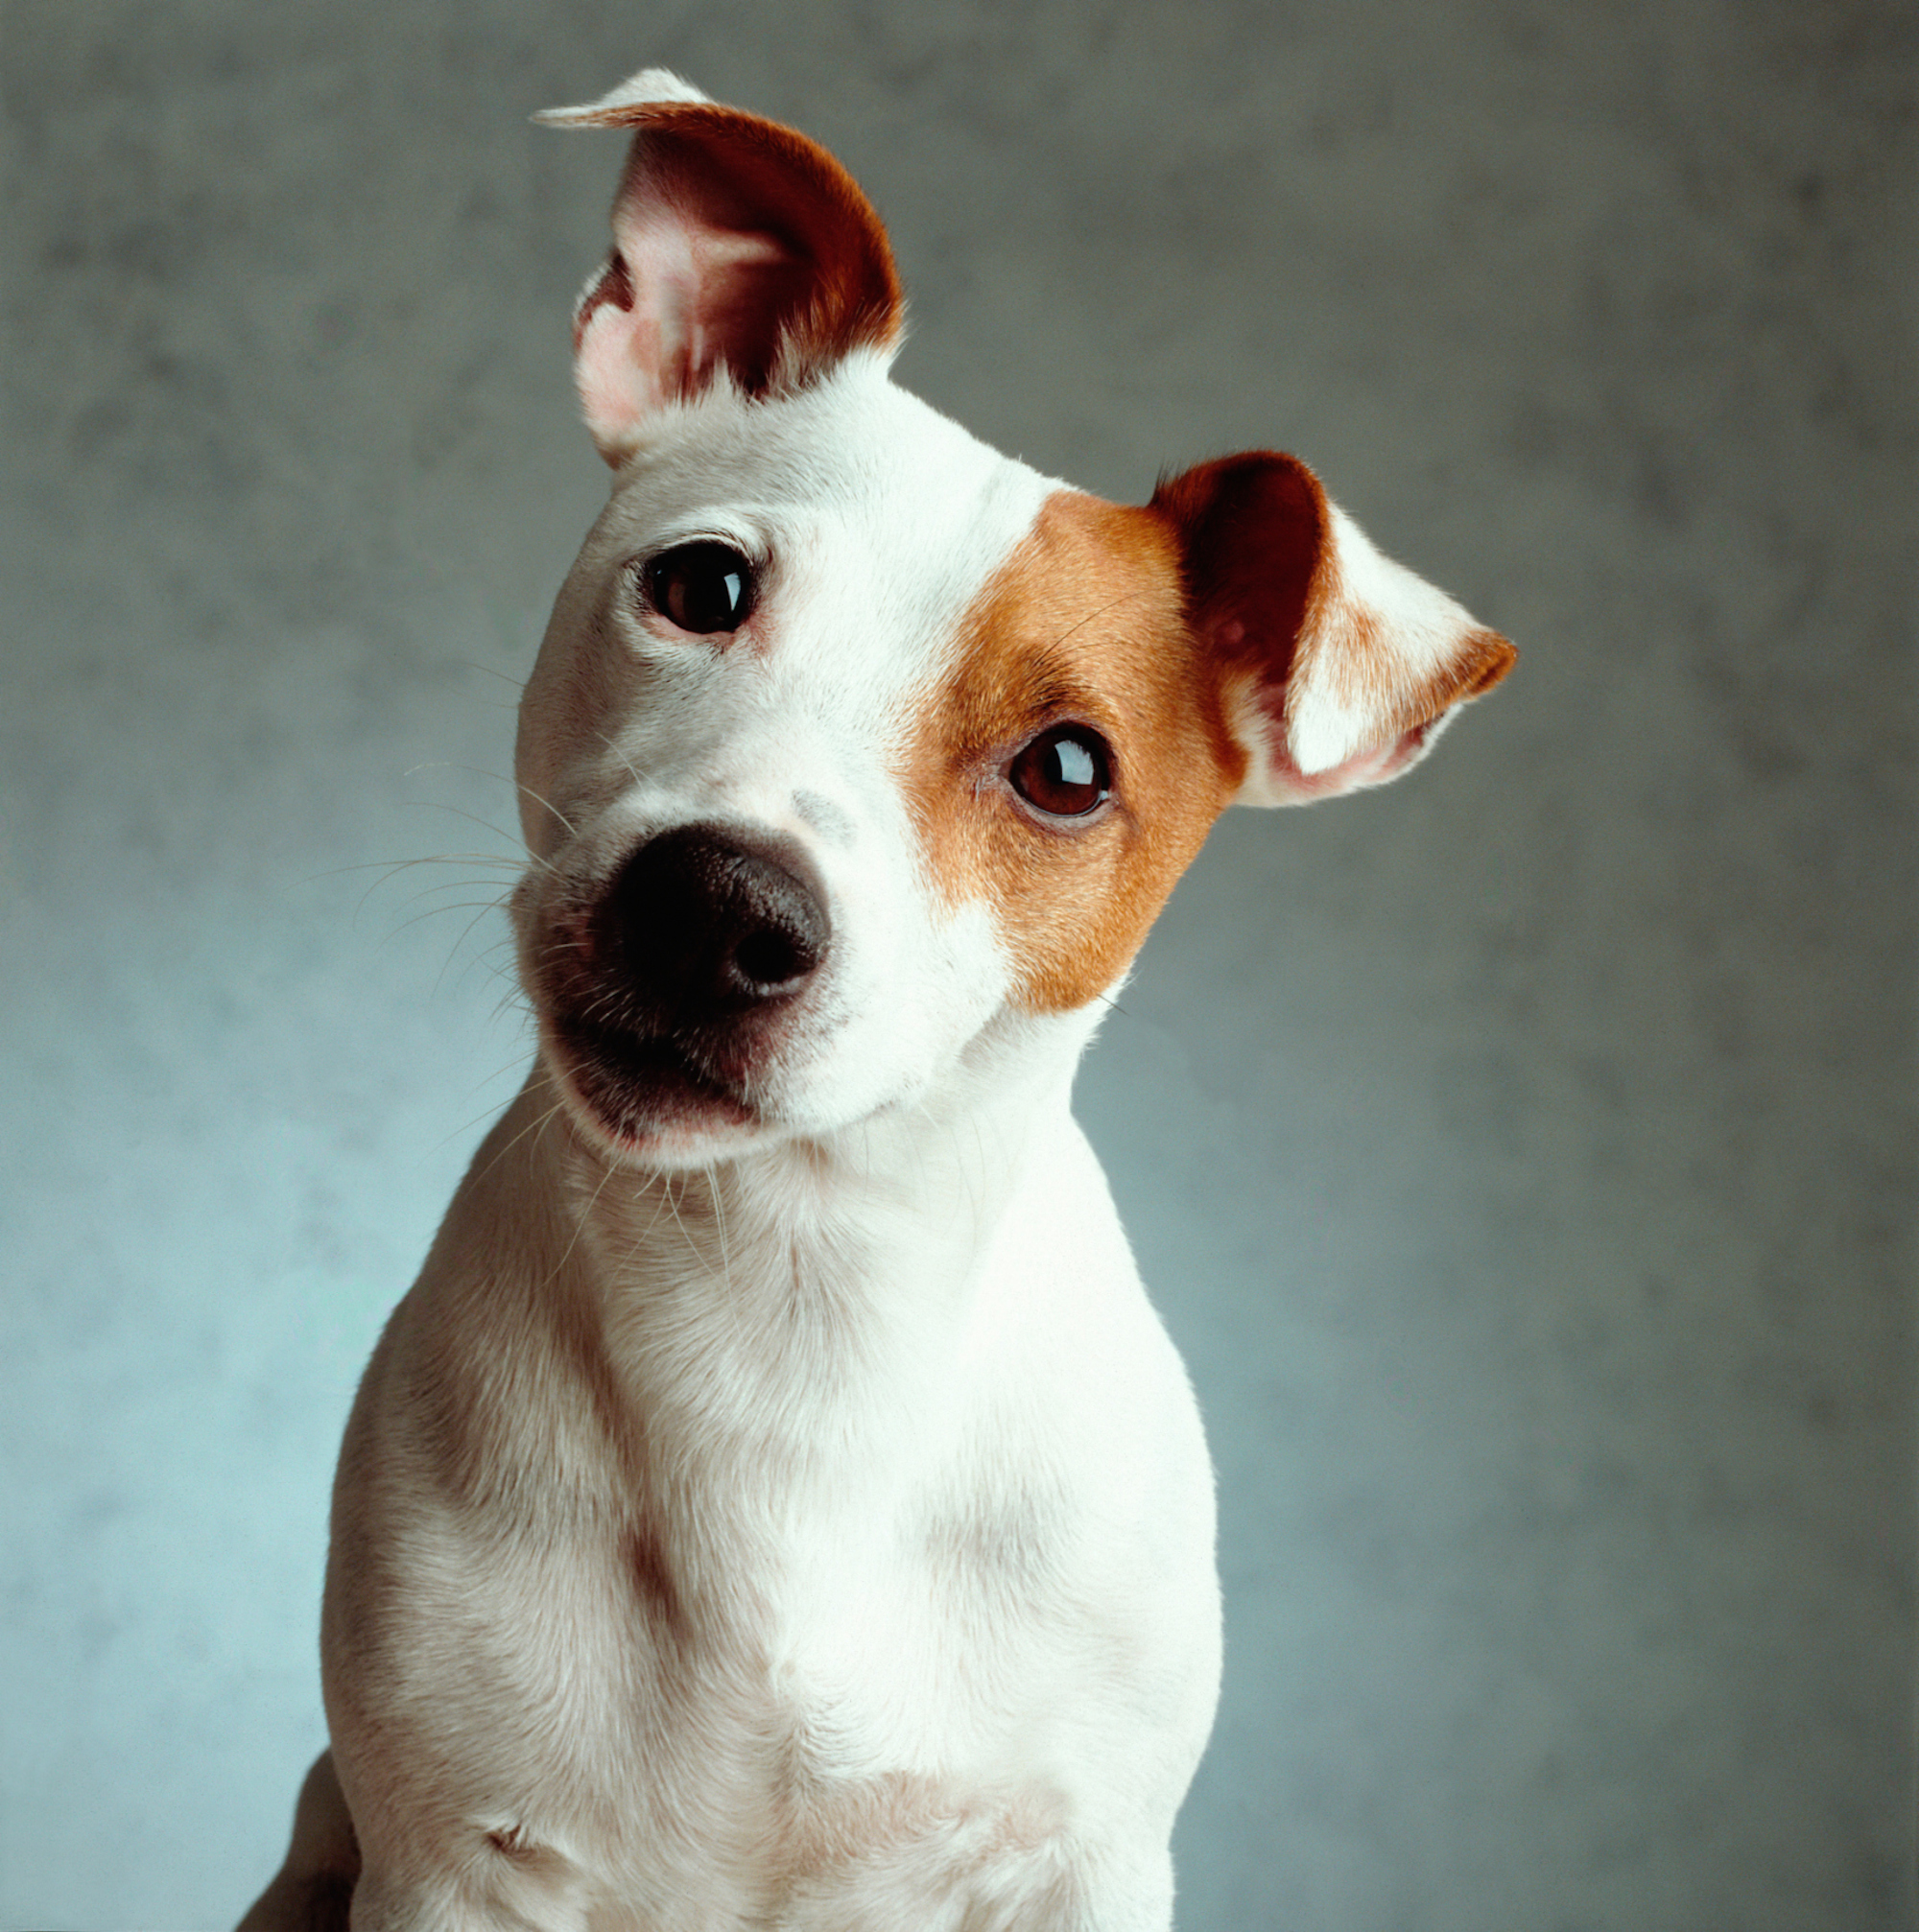 The 20 Most Popular Dog Names 2016 Best Dog Names 2016